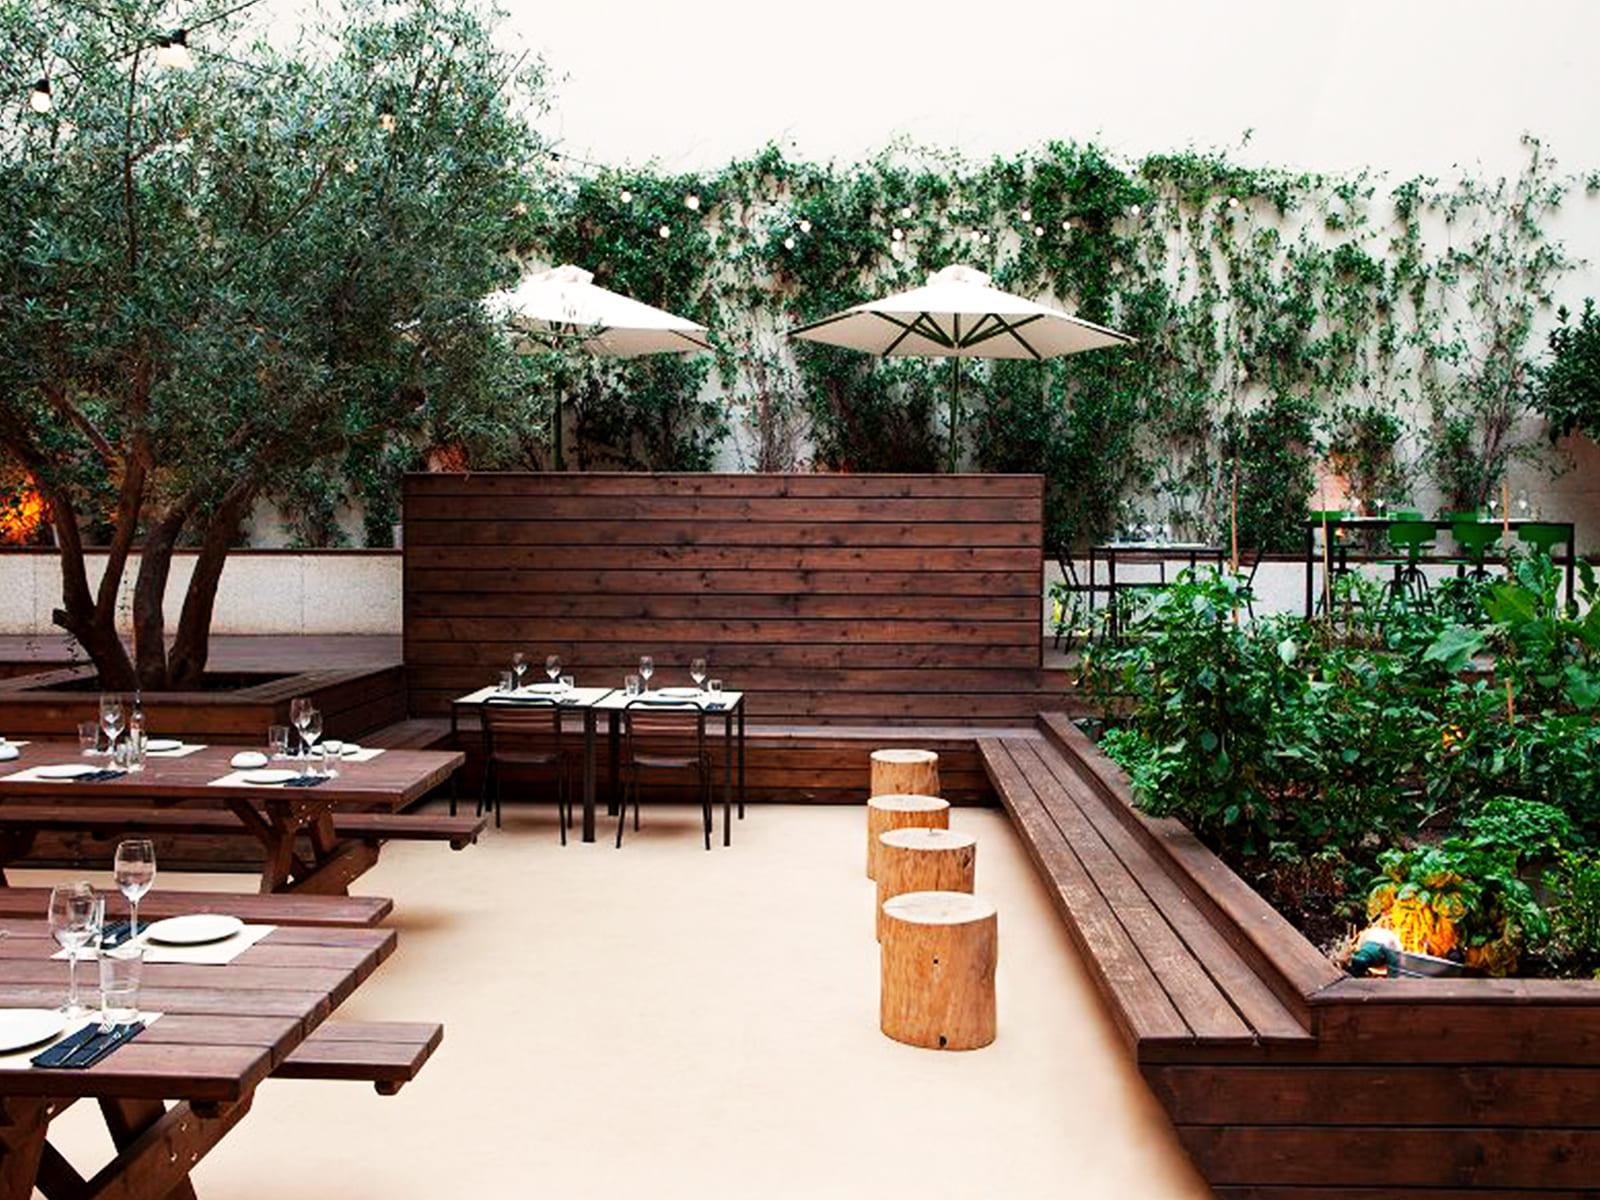 blog-vegetacion-decoracion-bares-restaurantes-16_HIDROJARDIN-Bañeres